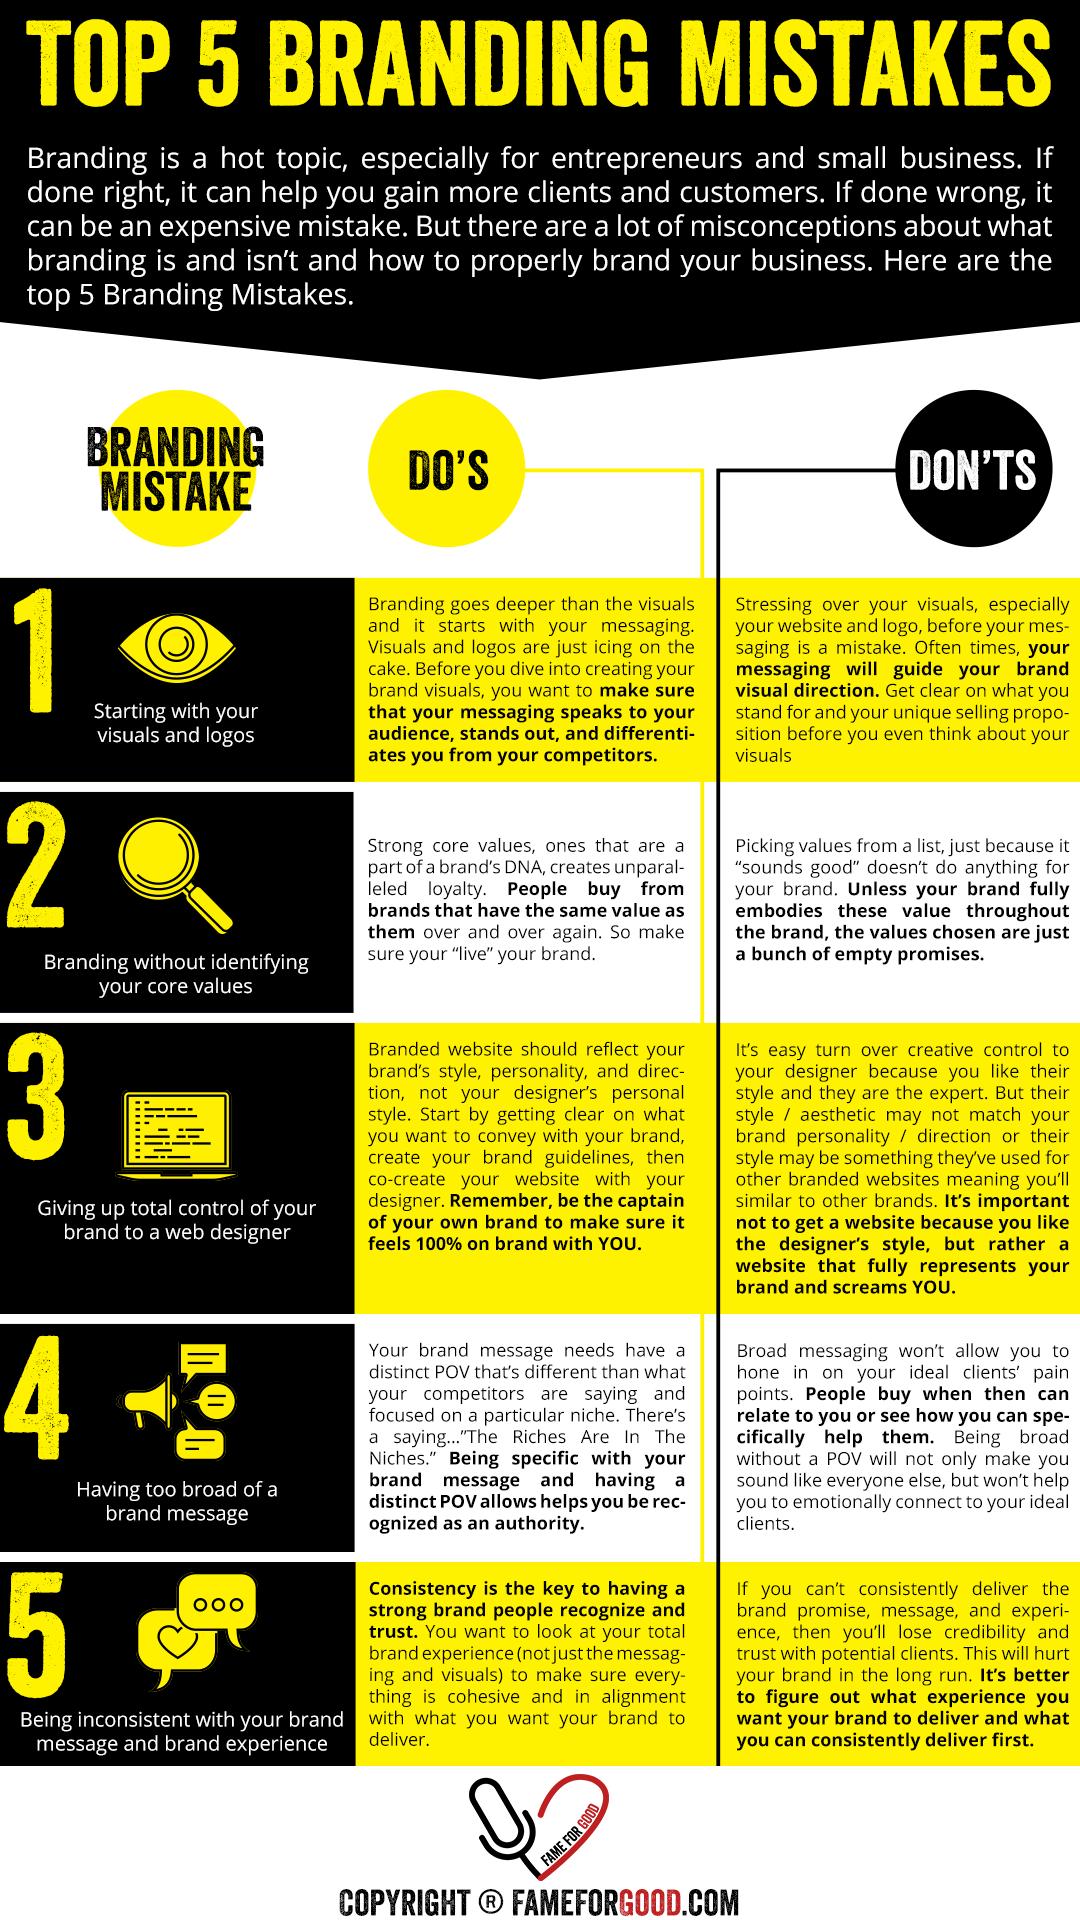 Top 5 Branding Mistakes